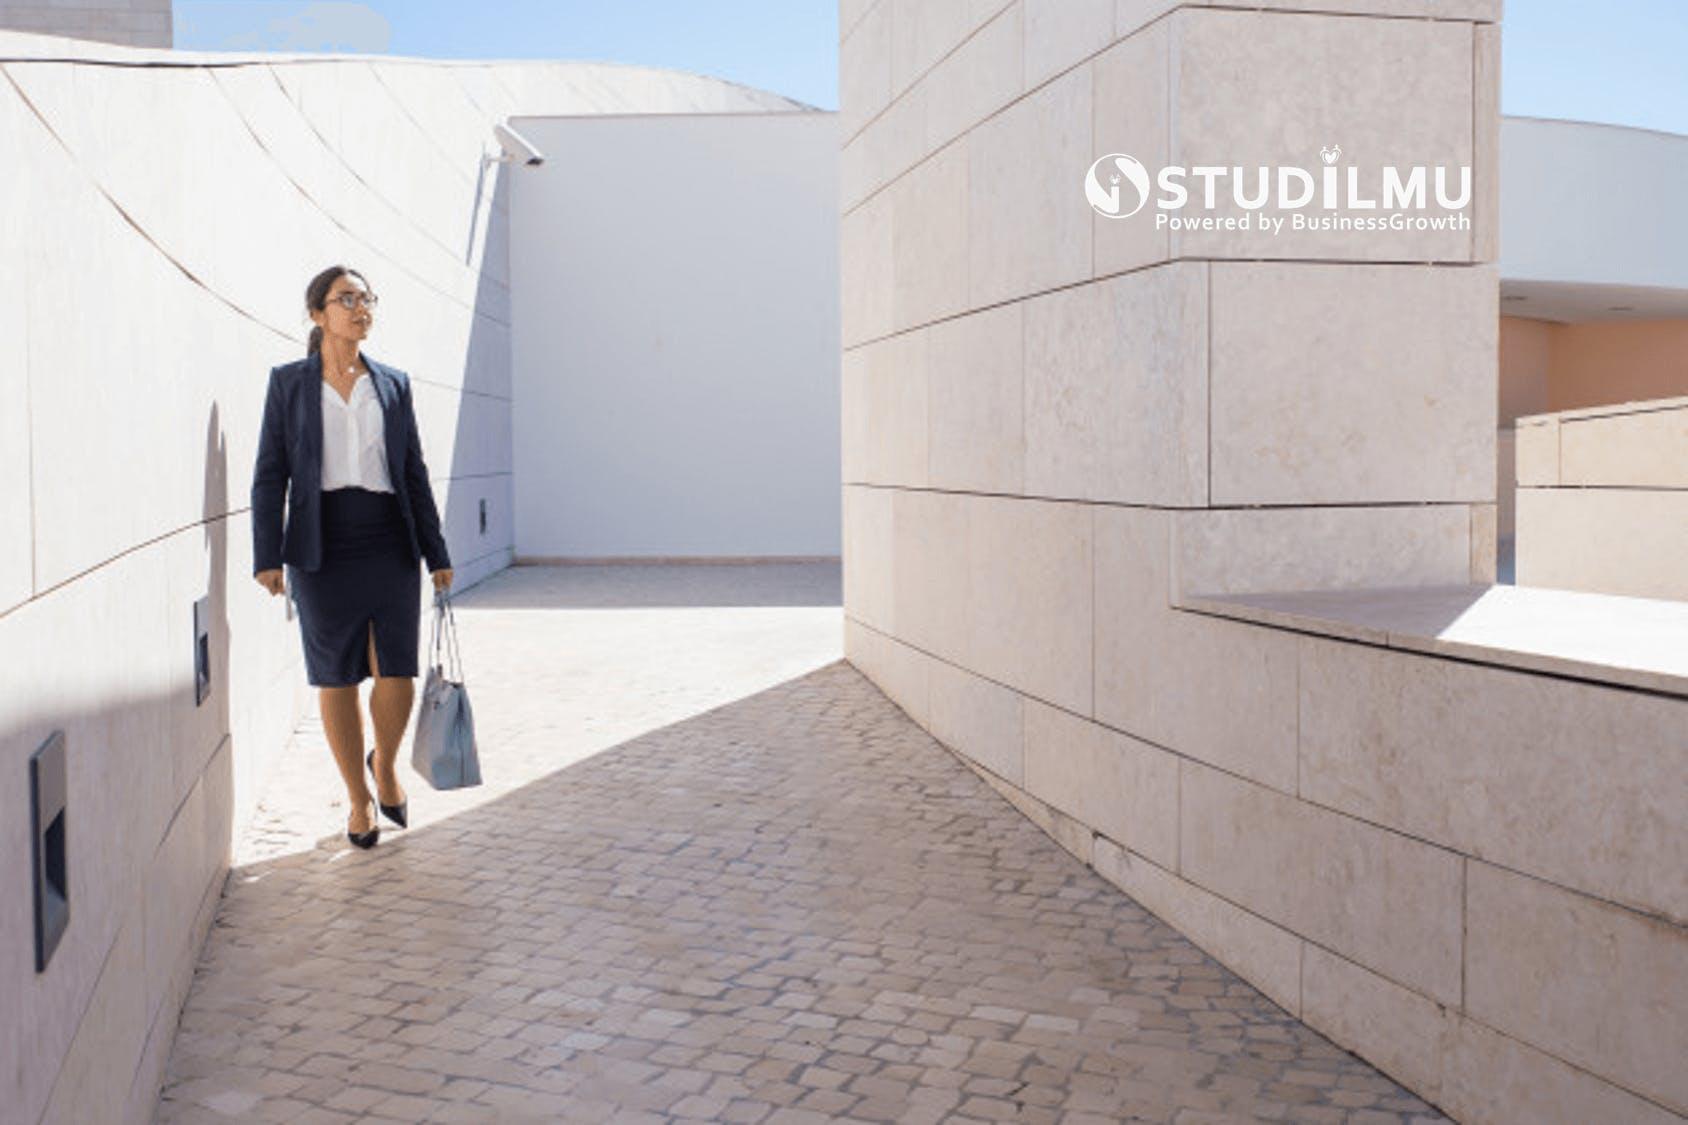 STUDILMU Career Advice - Budaya Inklusi Adalah Kunci Sukses Organisasi